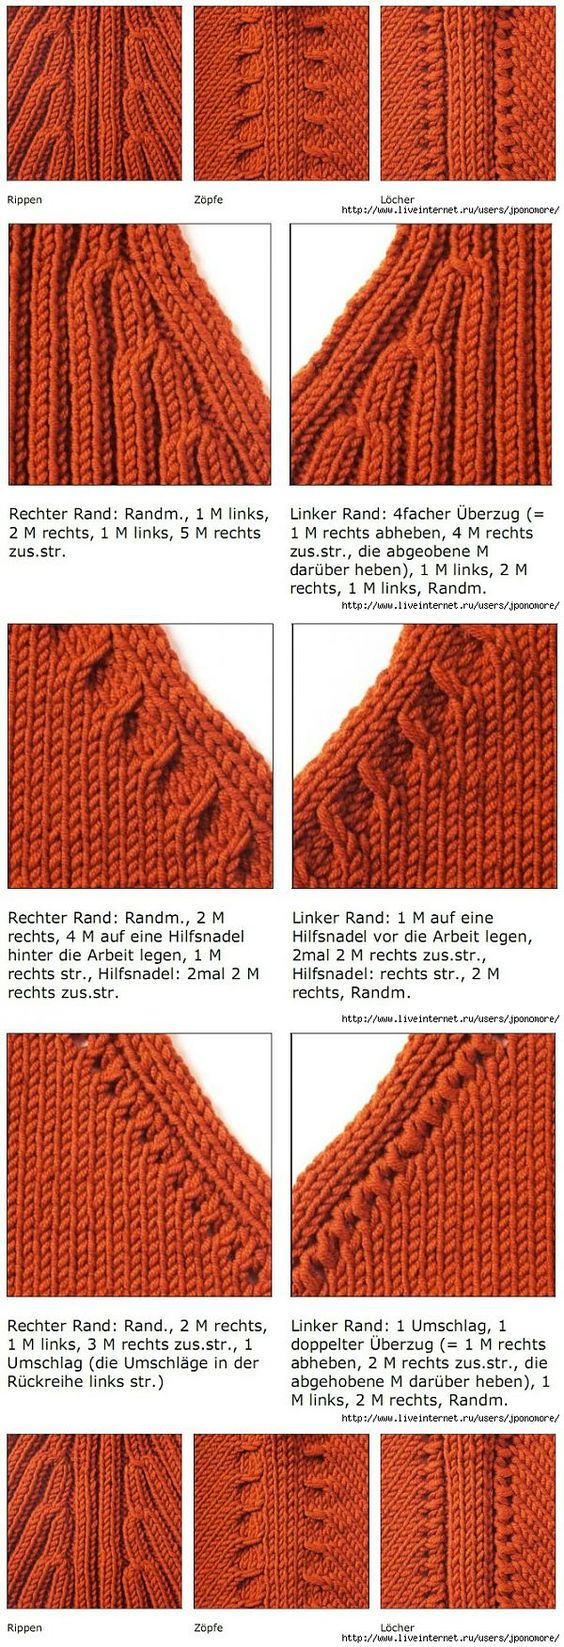 Knitting Ssk Instructions : Knitting sleeve and google translate